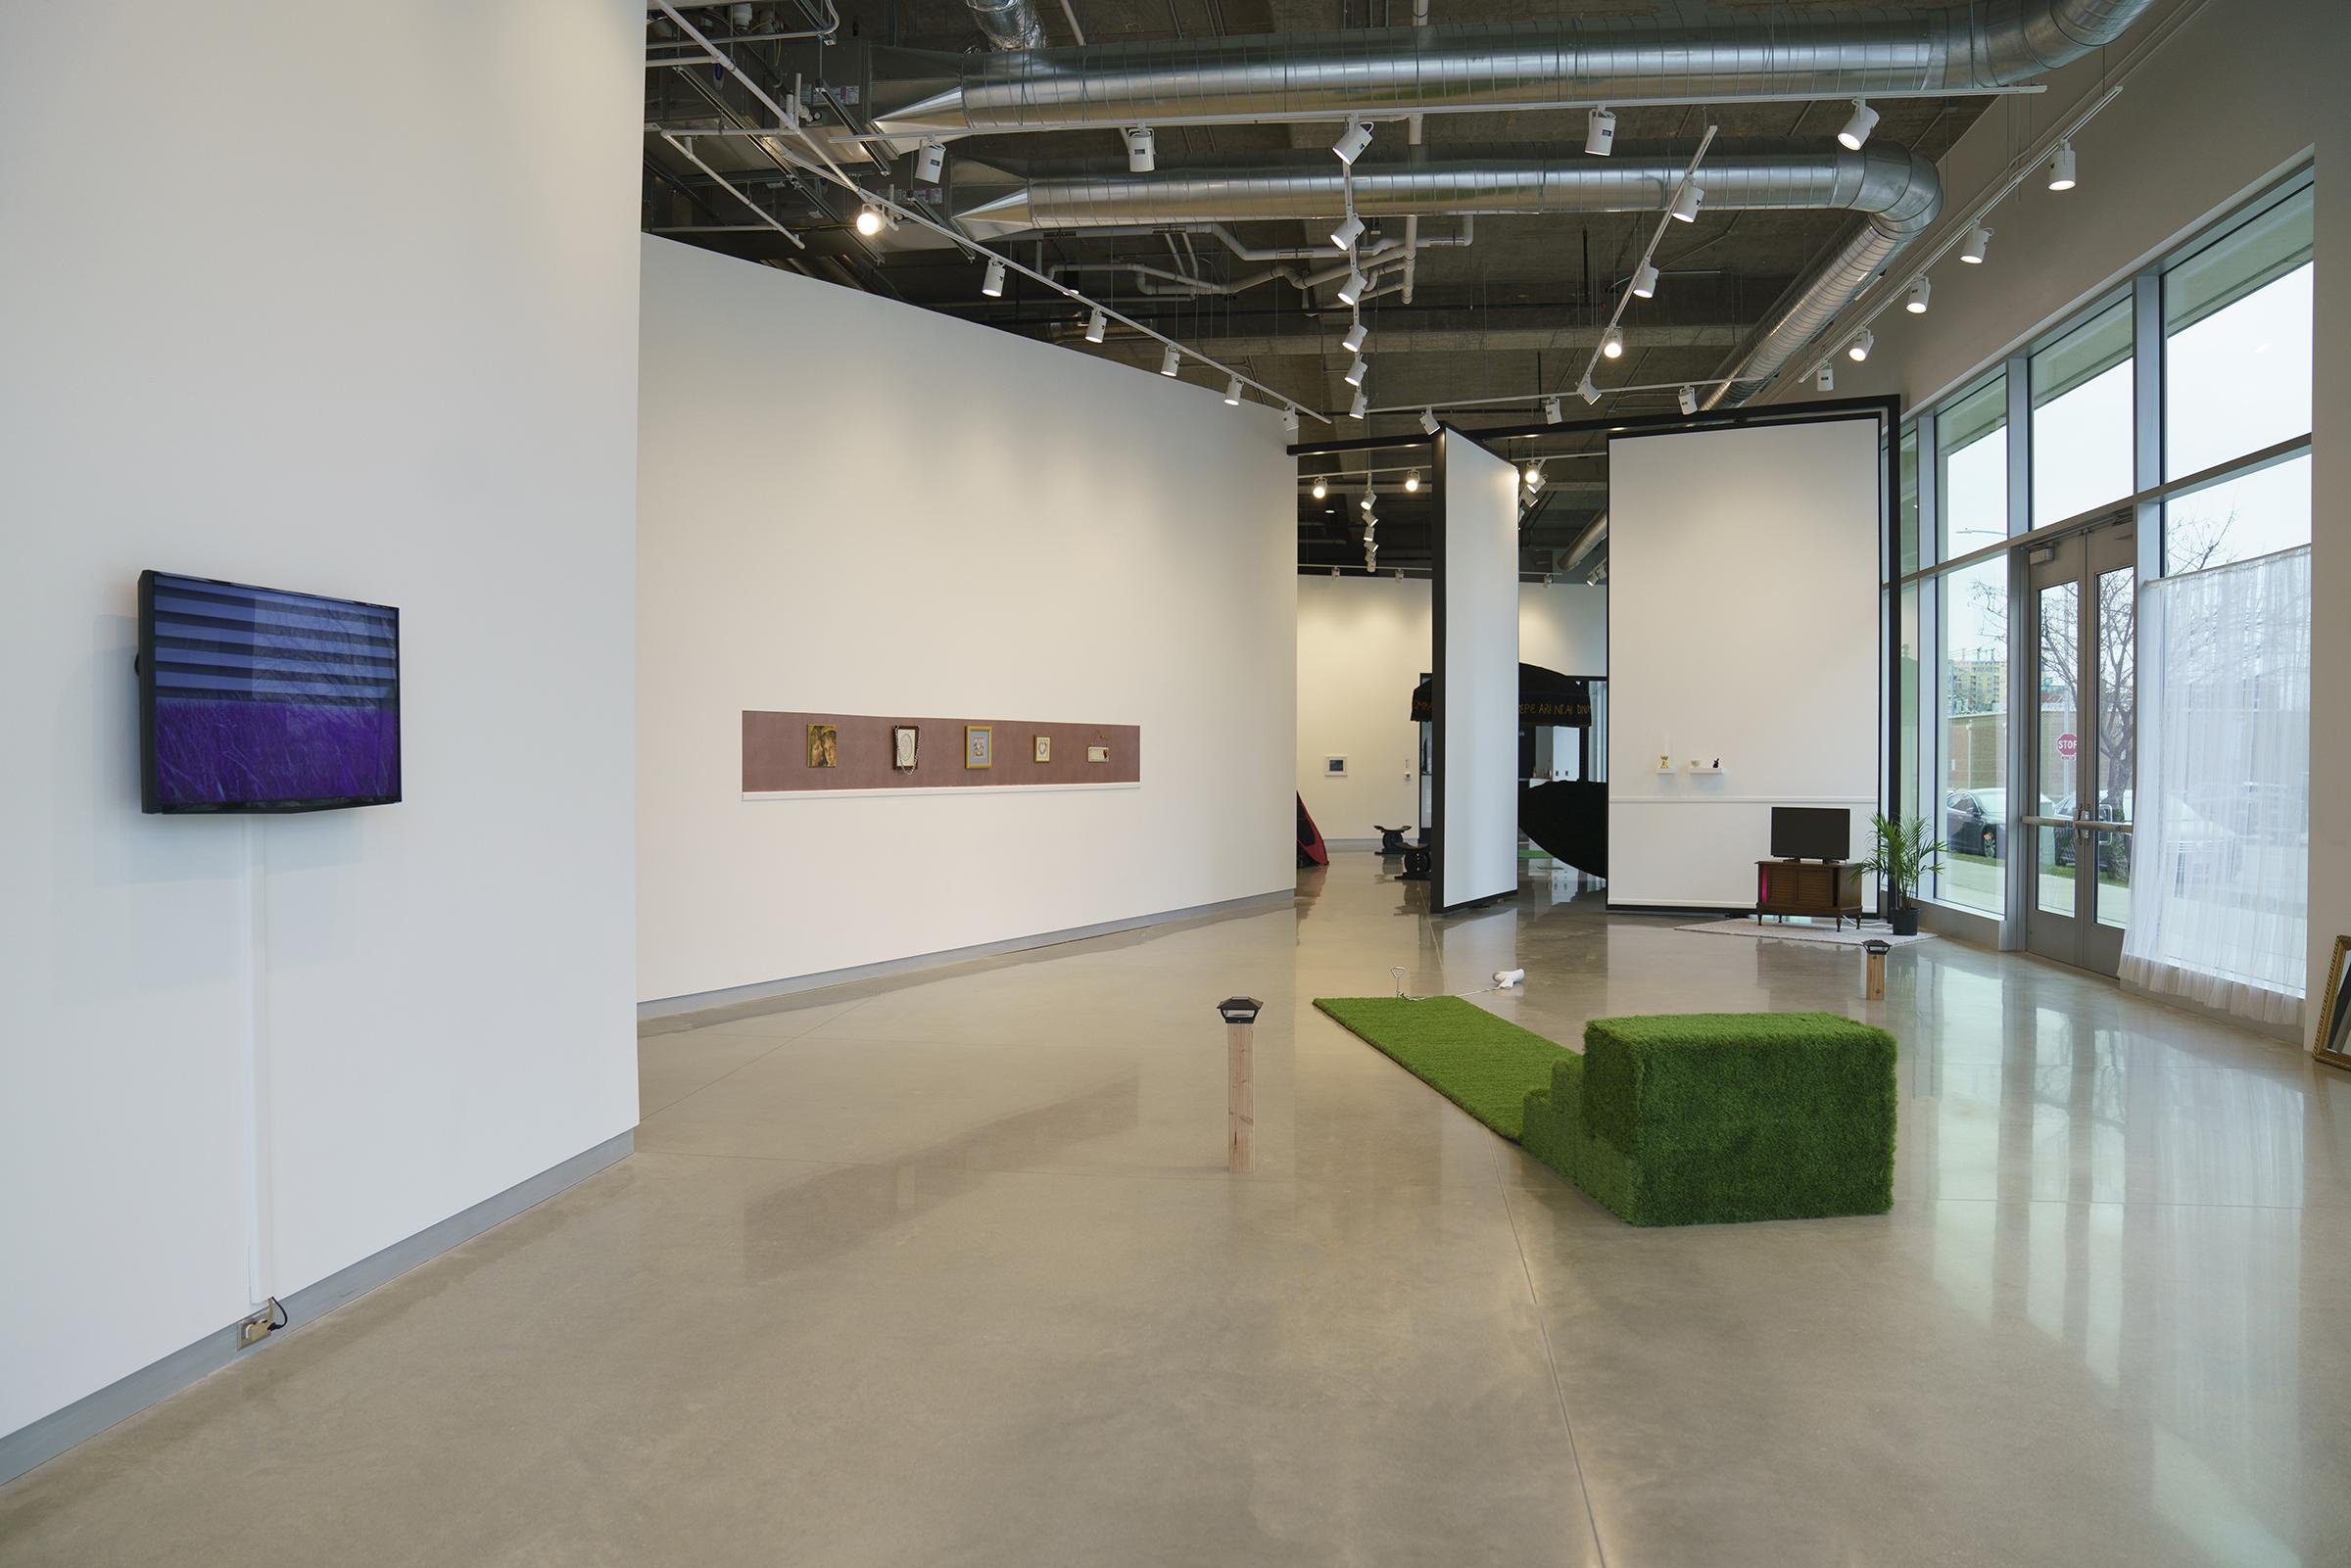 Installation view of (Sub)urbia Master of Fine Arts Exhibition by Conley Clark at the Arts + Literature Laboratory.